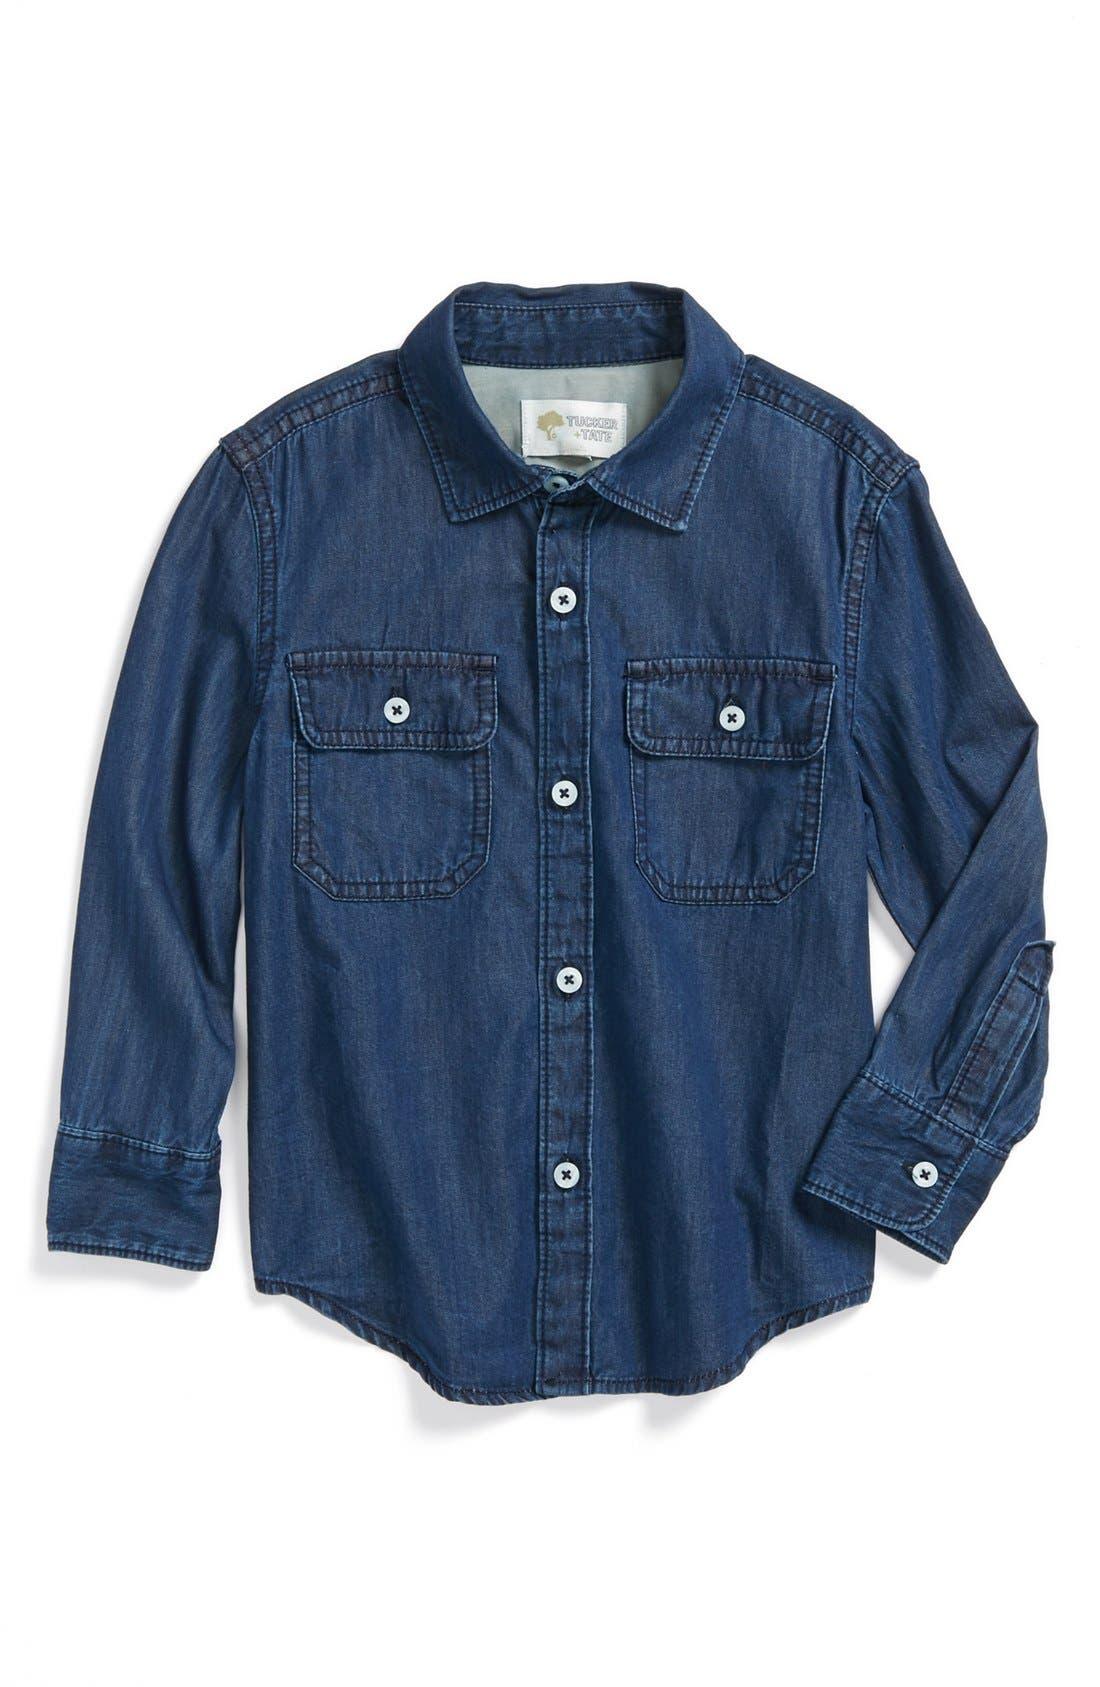 Main Image - Tucker + Tate 'Anker' Denim Shirt (Toddler Boys)